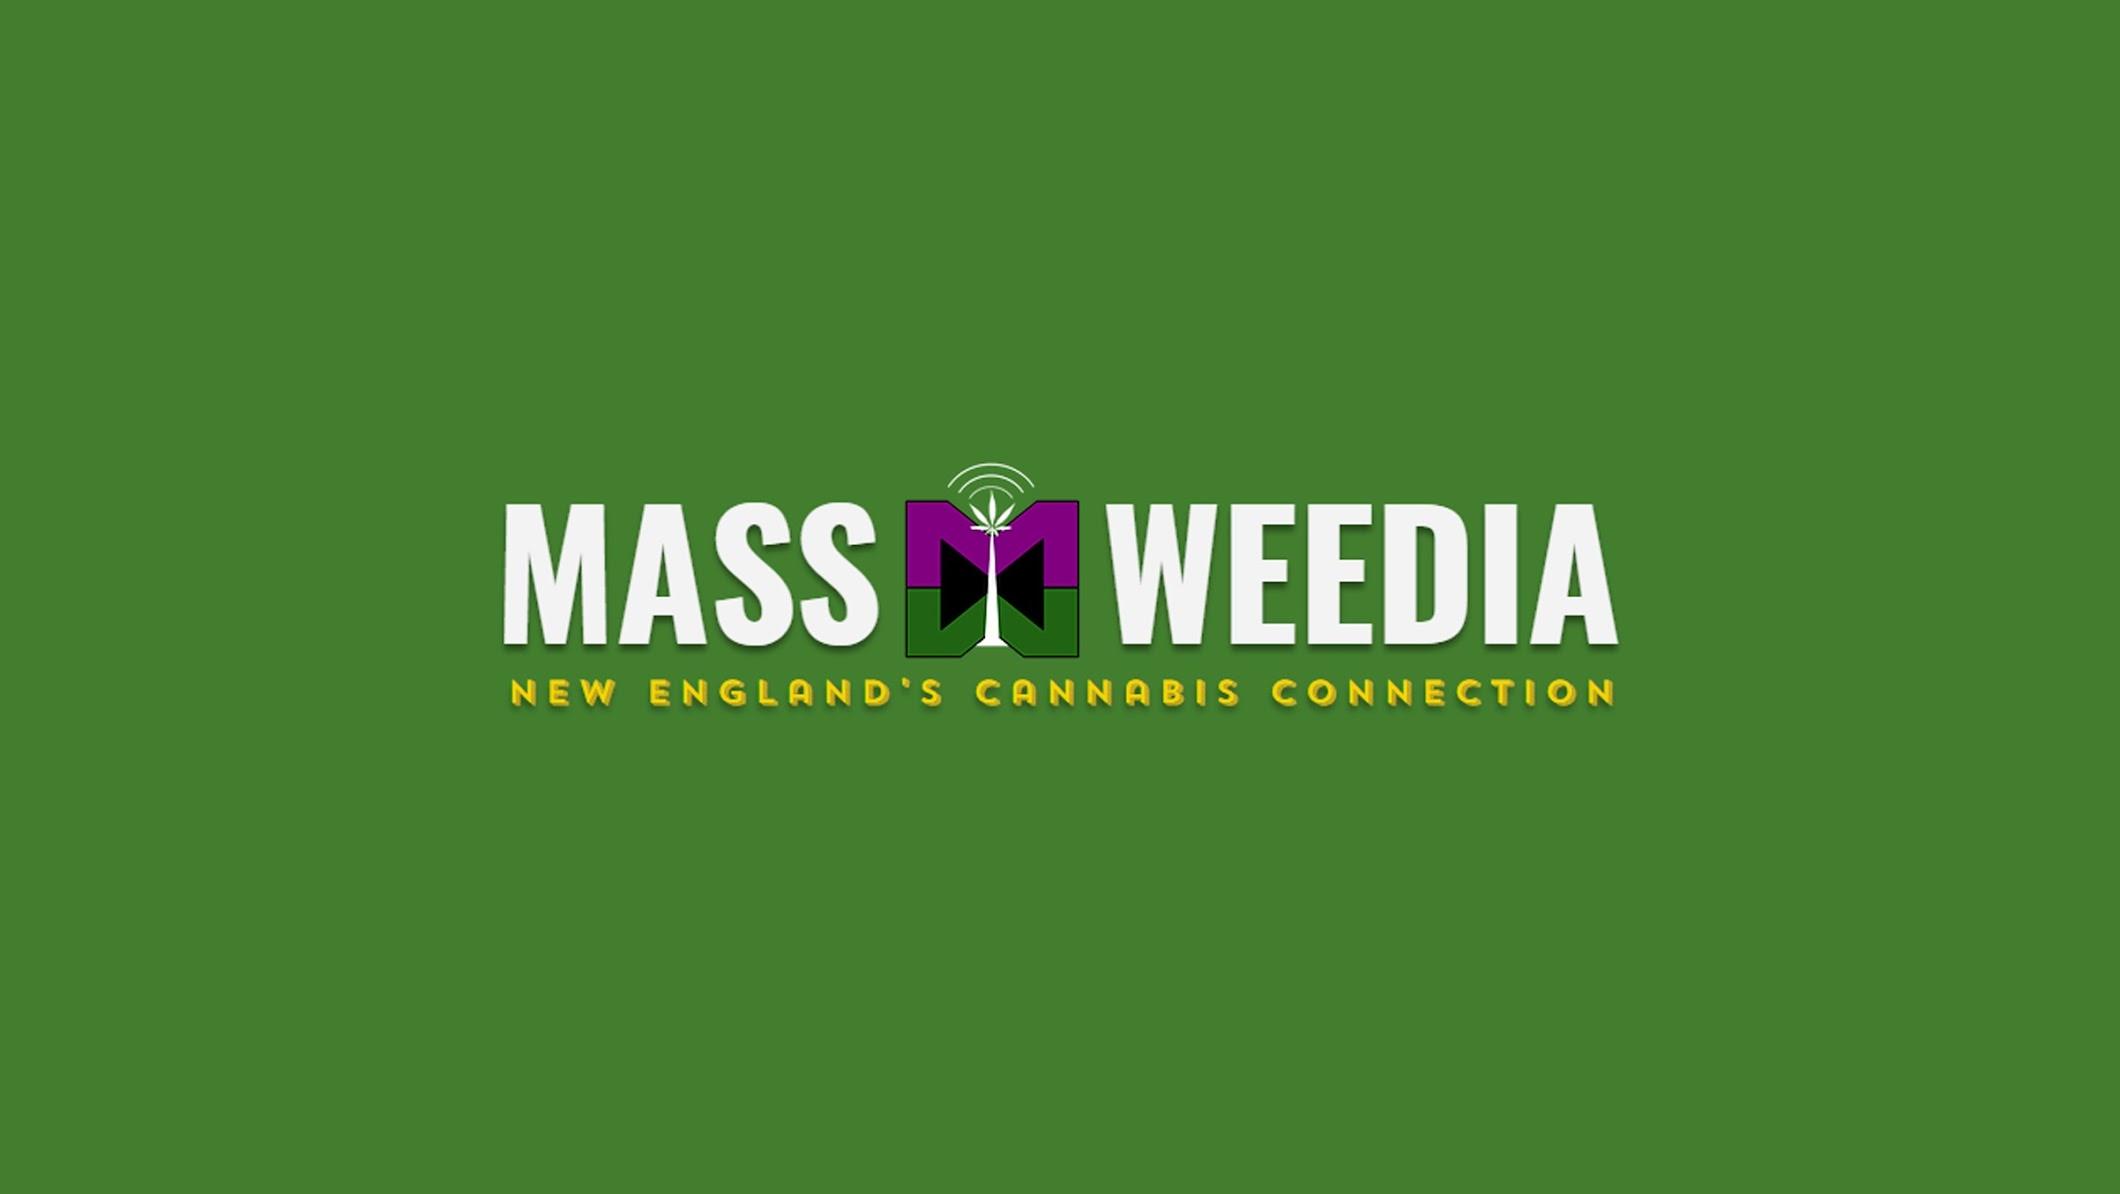 Mass Weedia